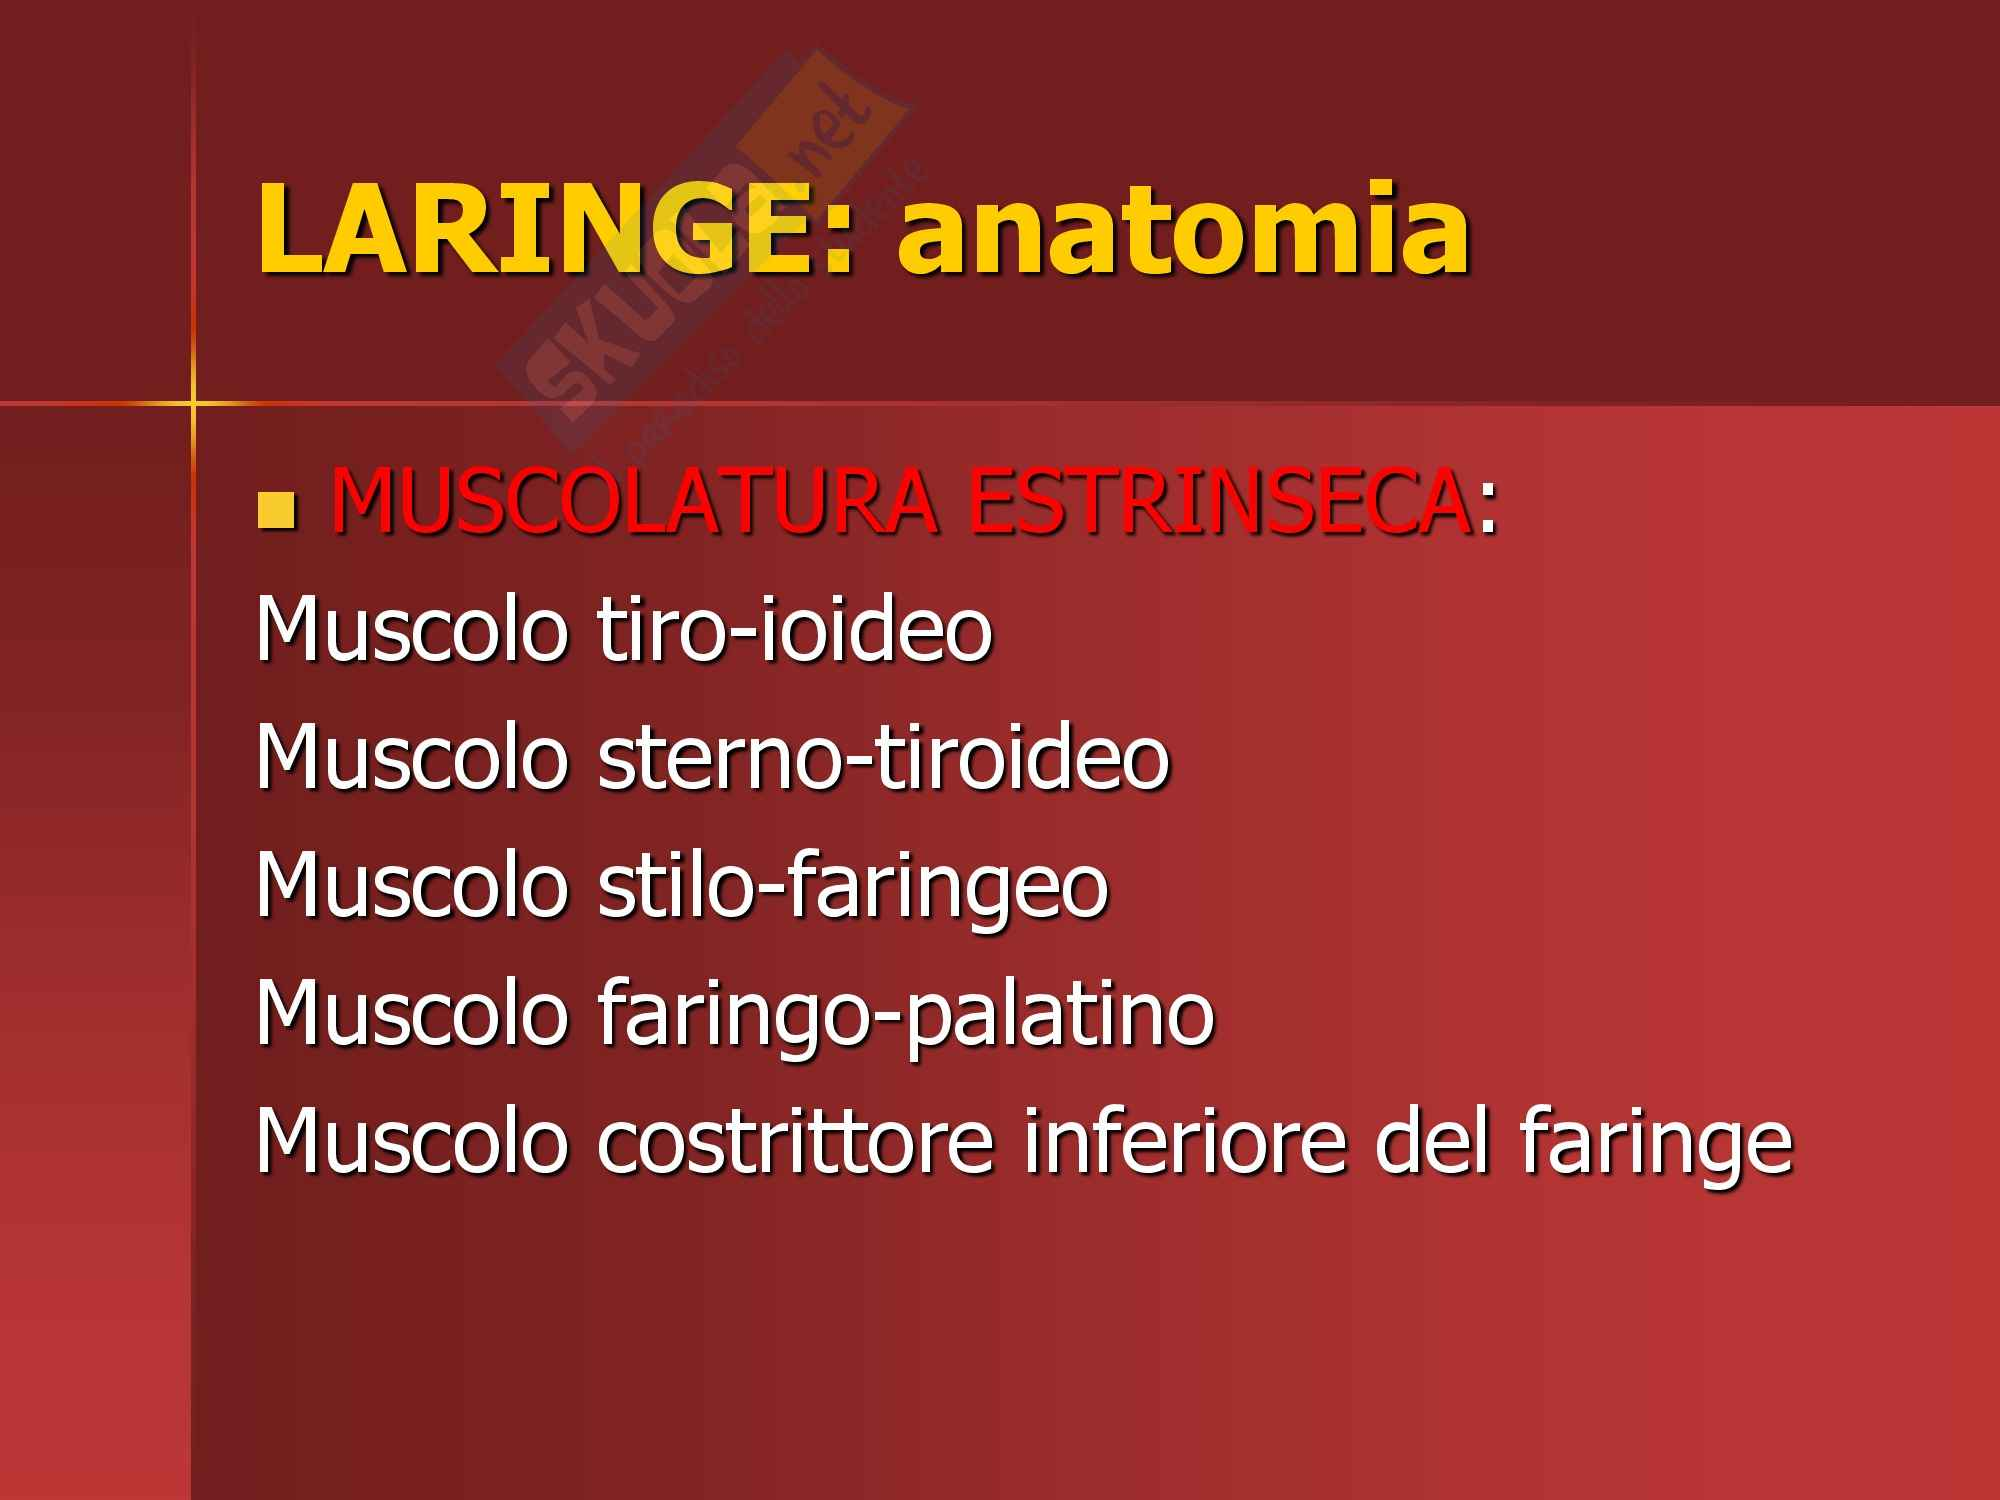 Otorinolaringoiatria - anatomia laringe Pag. 11